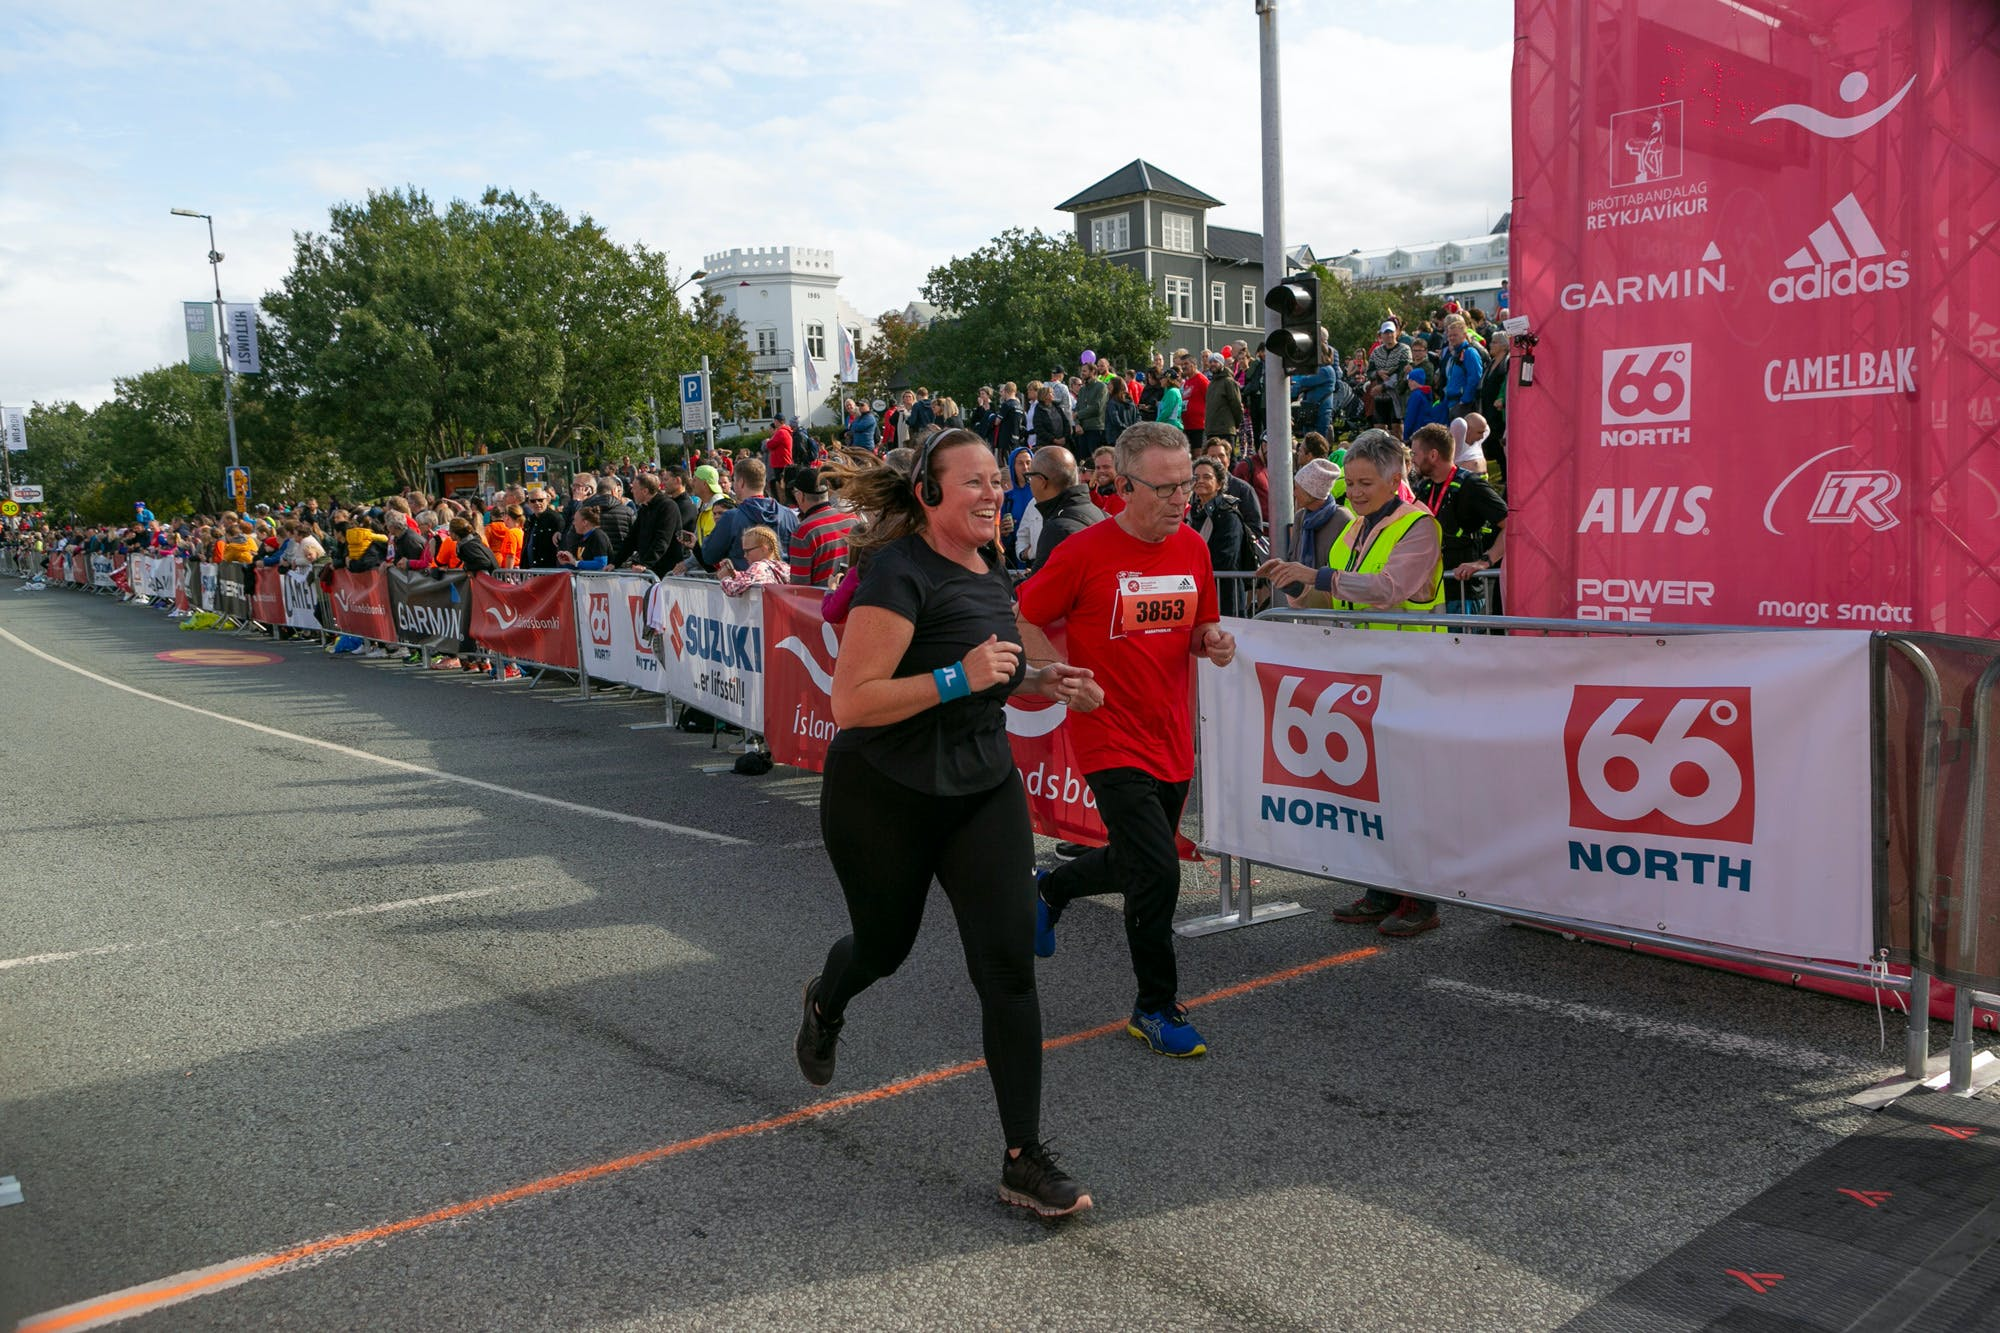 Participants finishing the Íslandsbanki Reykjavik Marathon